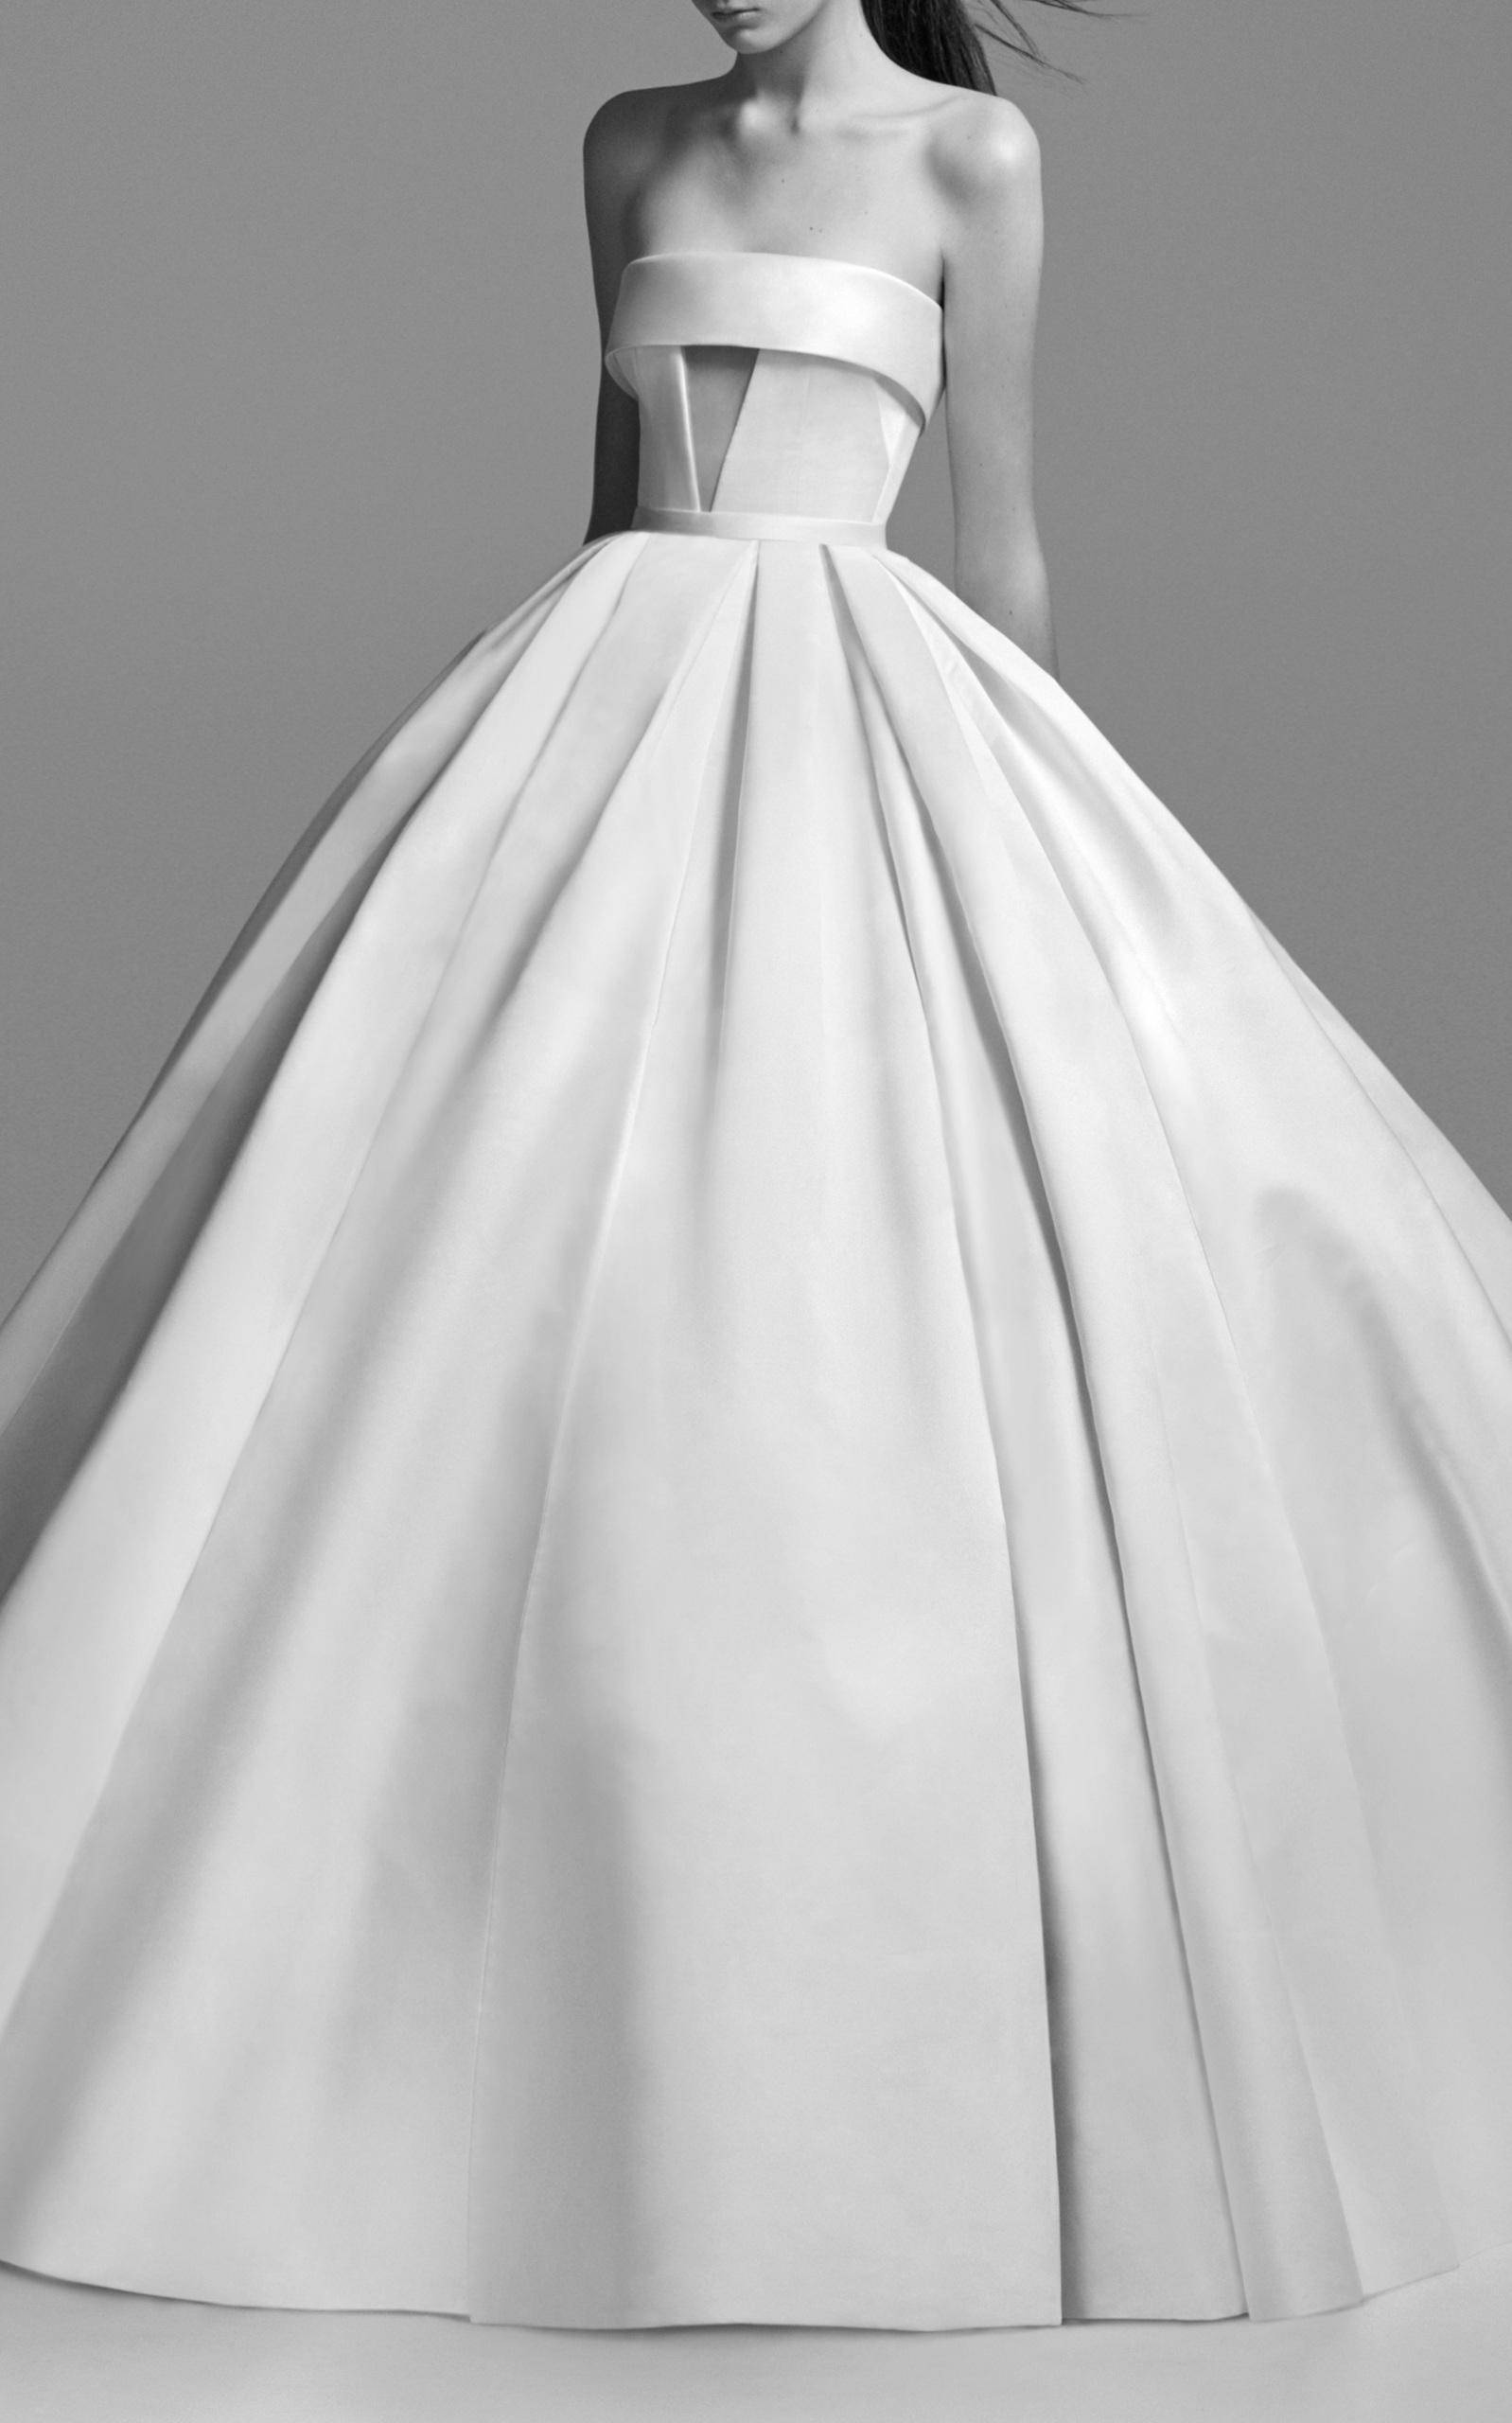 Alex Perry Bride Women's Riley Strapless Satin Cuff Gown In White